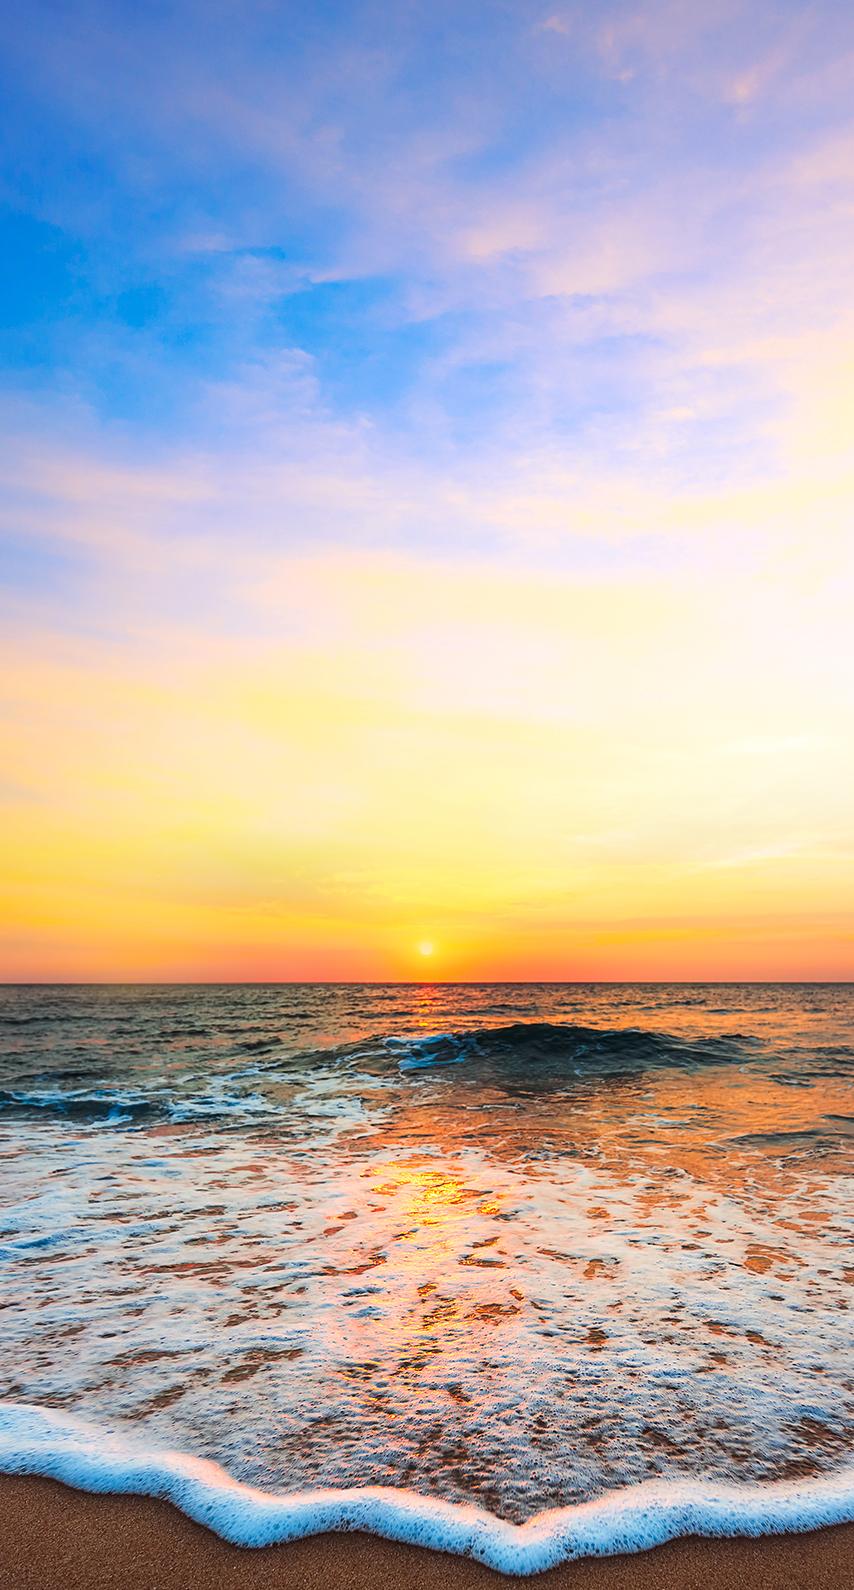 sunlight, coastal and oceanic landforms